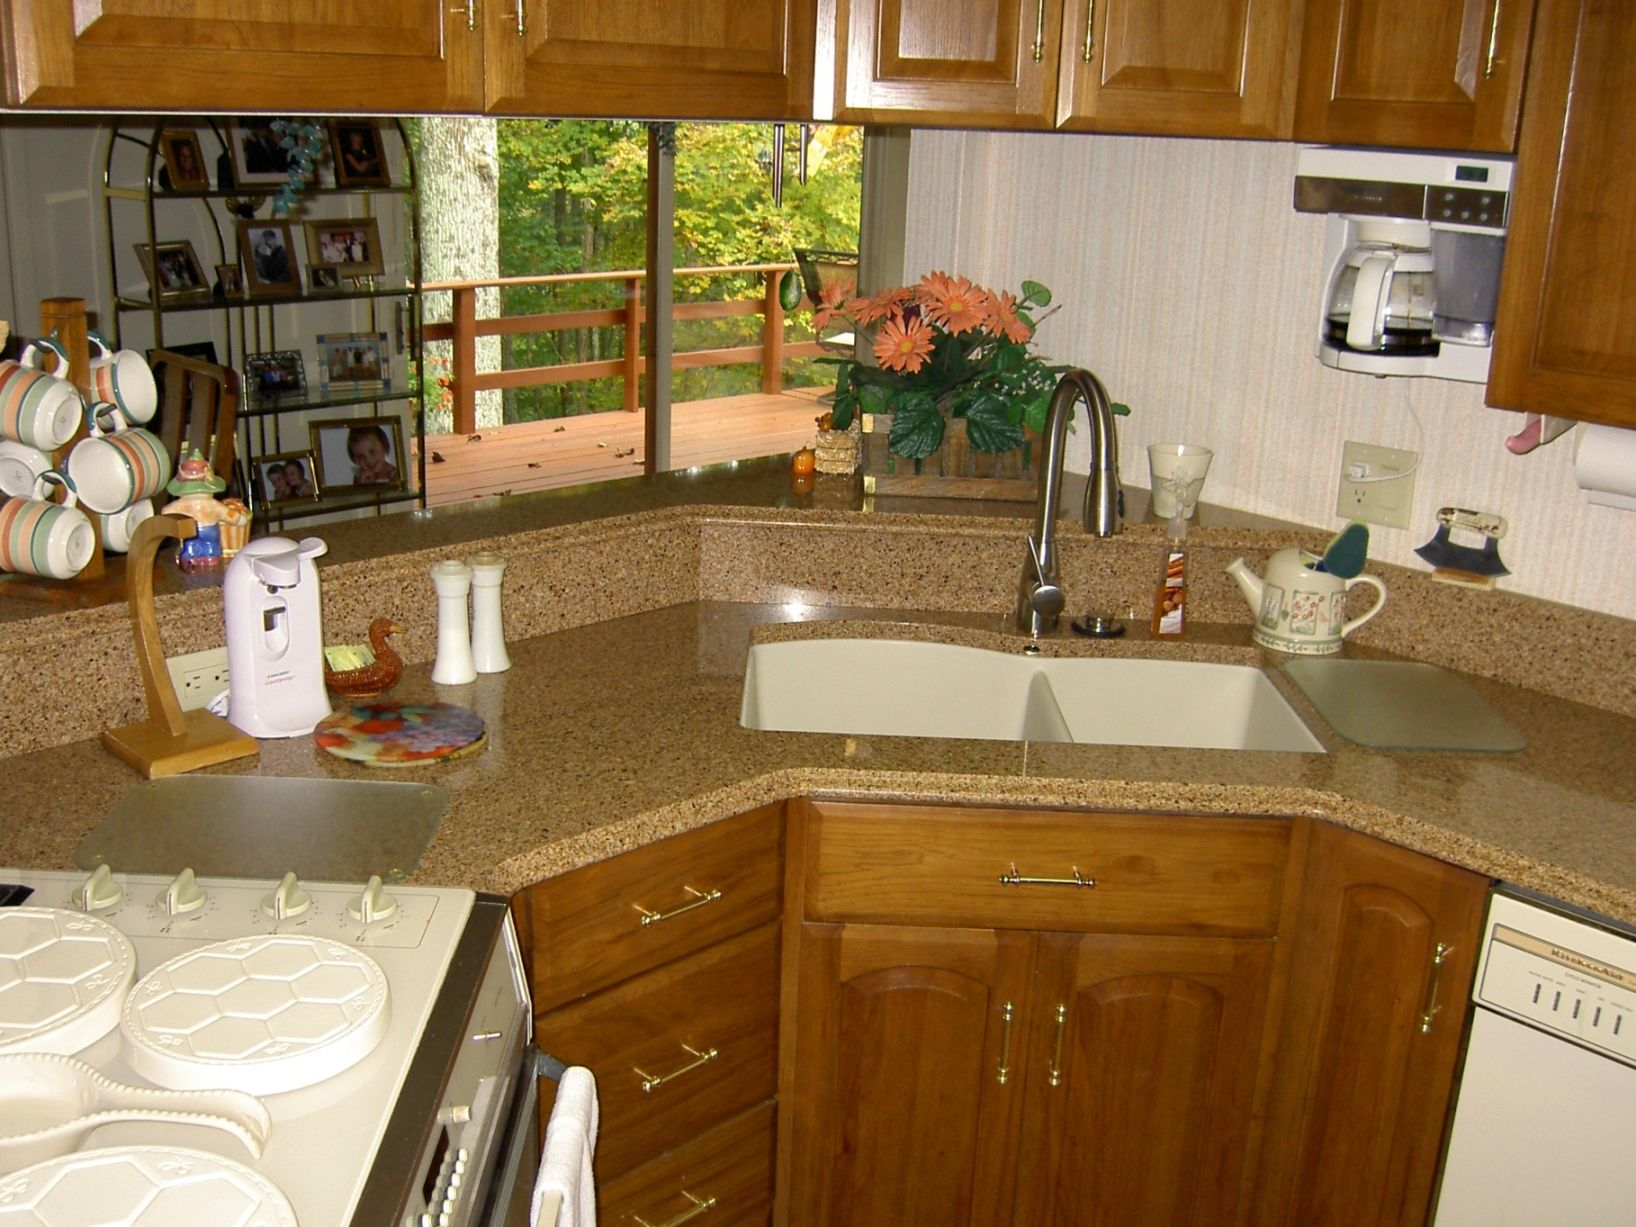 Kitchen quartz countertops with oak cabinets quartz for Kitchen quartz countertops